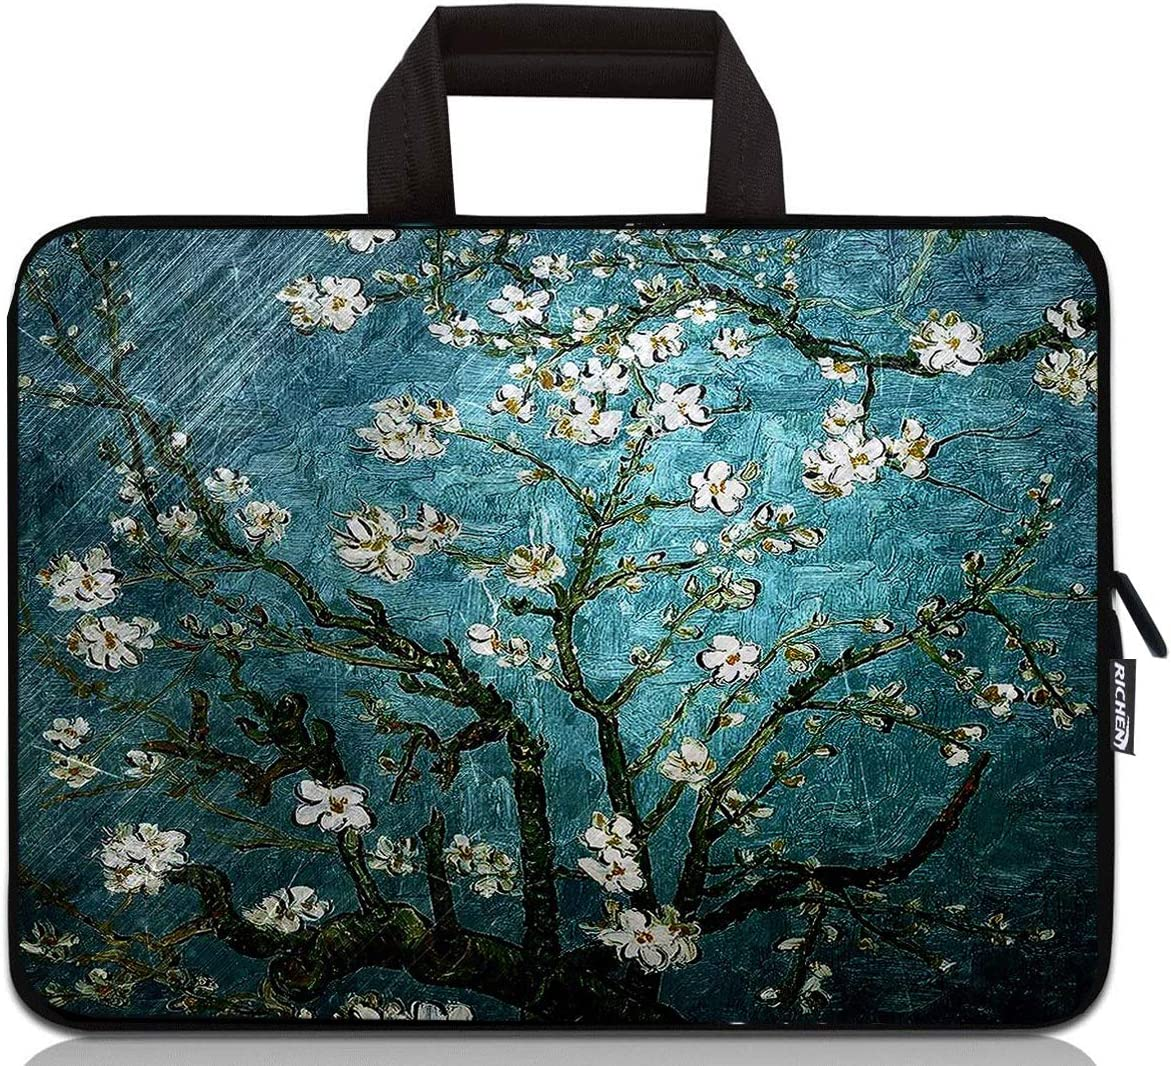 Neoprene Sleeve Laptop Handle Bag Handbag Notebook Case Cover Hand Drawn Gymnocalycium Erinaceum Chin Cactus Portable MacBook Laptop//Ultrabooks Case Bag Cover 13-13.3 Inch